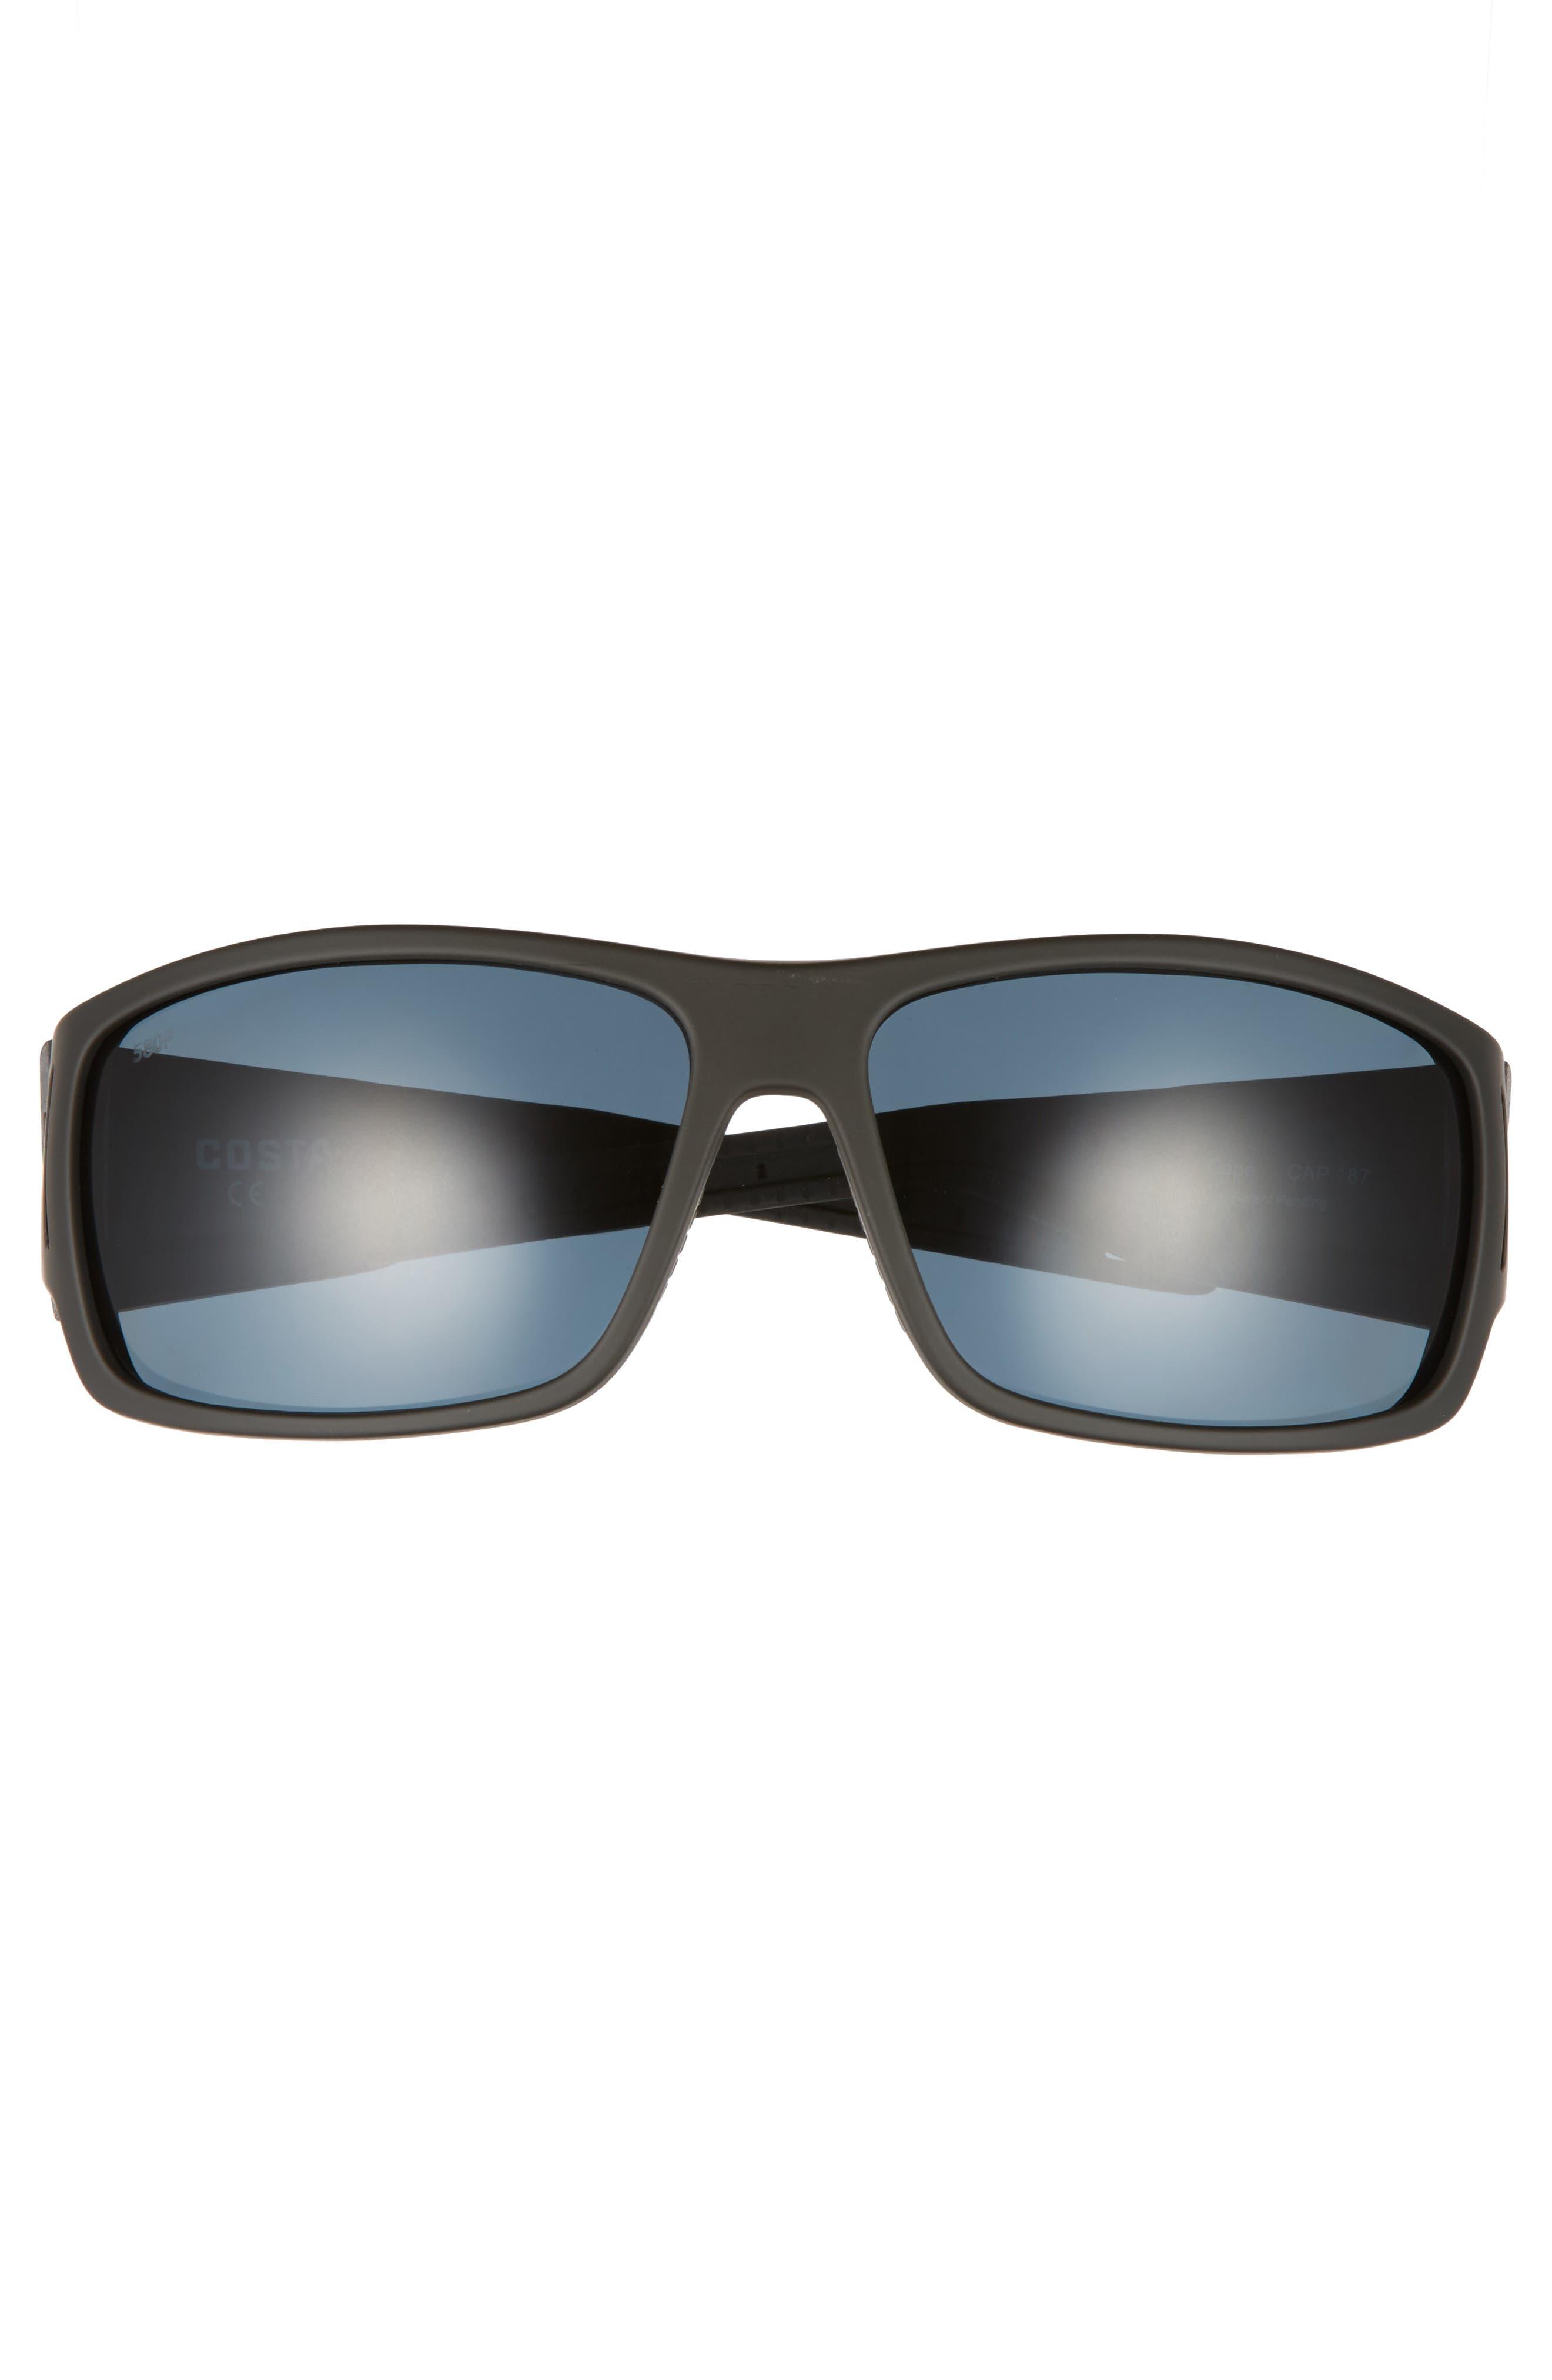 Cape 66mm Polarized Sunglasses,                             Alternate thumbnail 2, color,                             MATTE BLACK/ GRAY